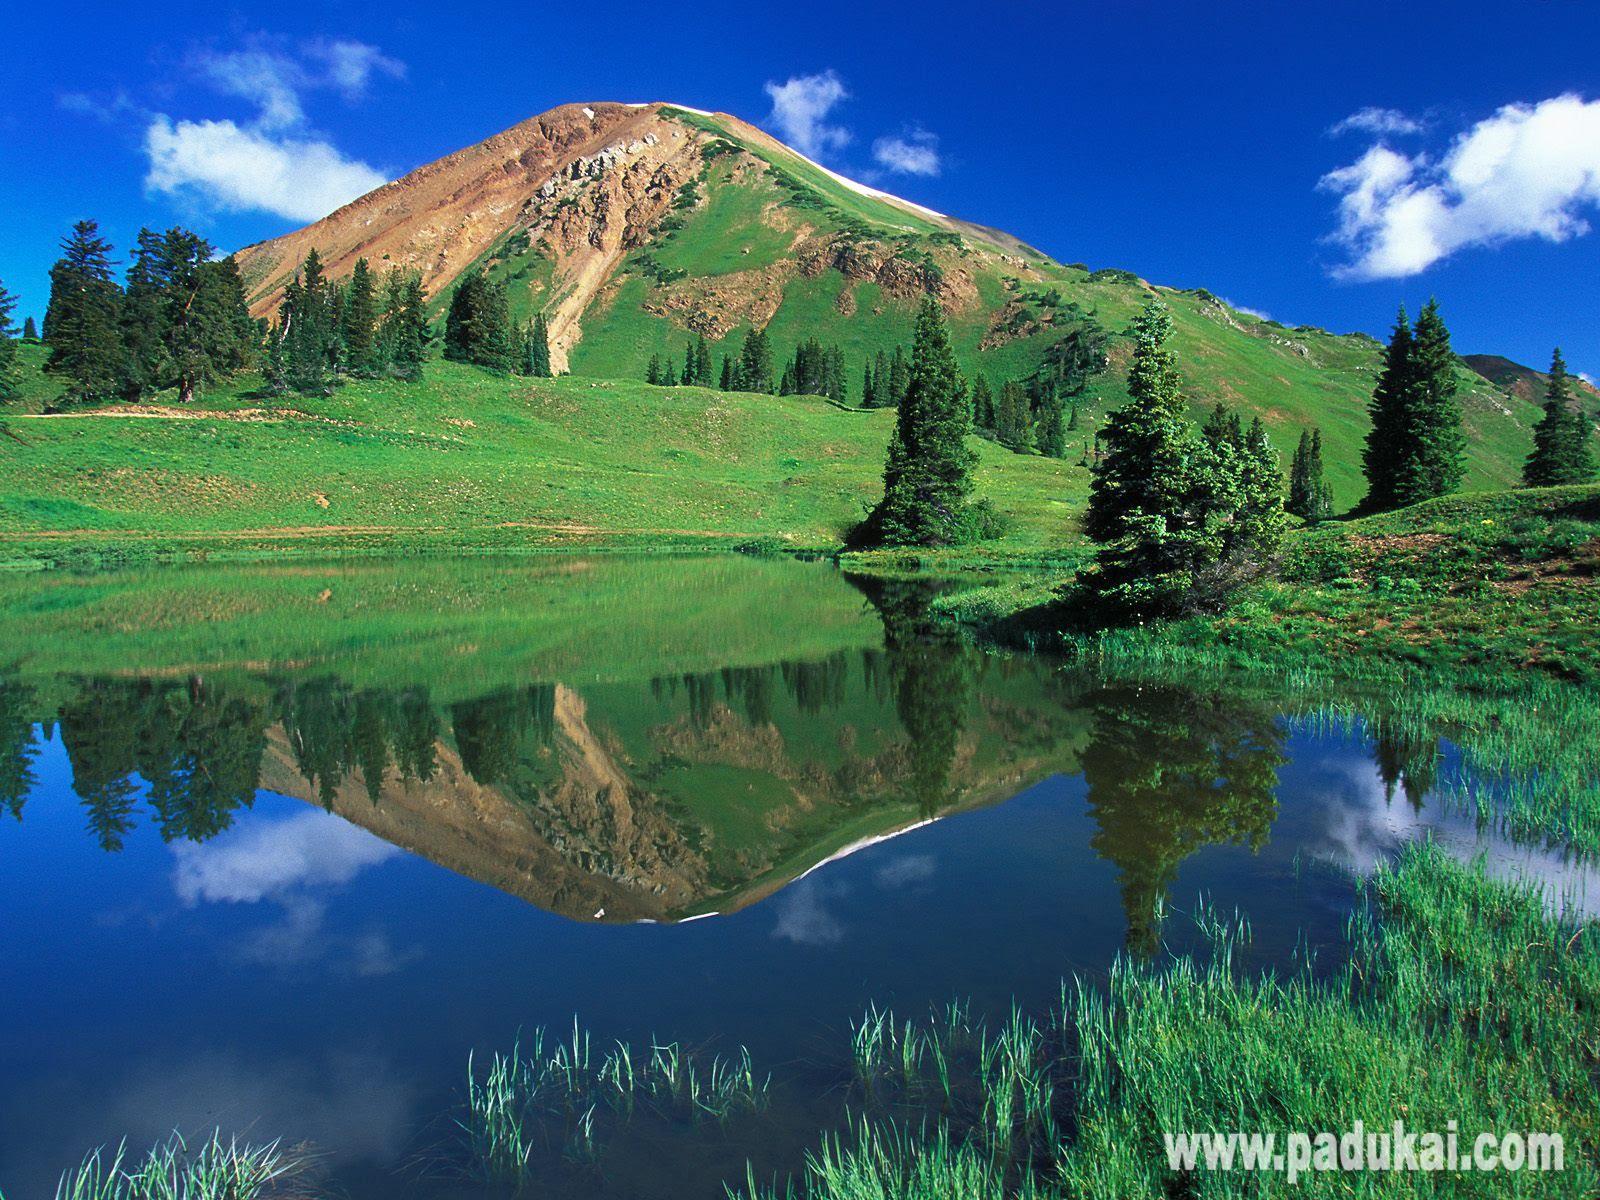 nature sceneries scenery desktop natural most water wallpapers scenic beauty summer min win waterfalls backgrounds